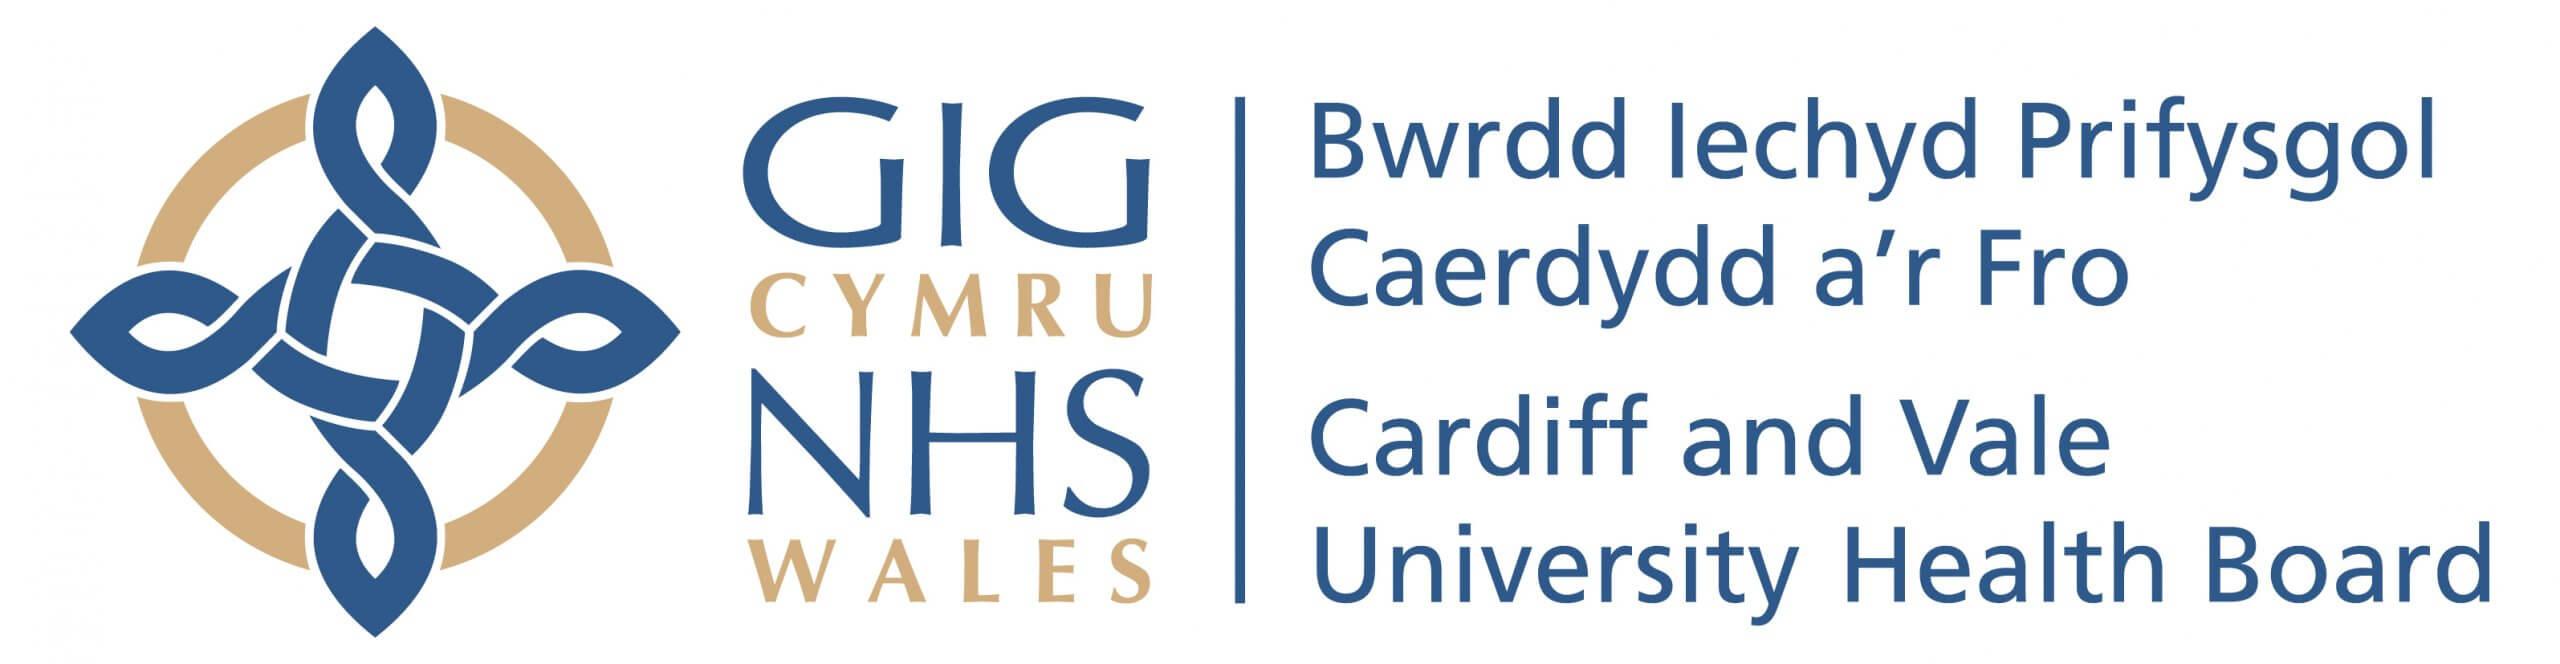 Cardiff & Vale University Health Board